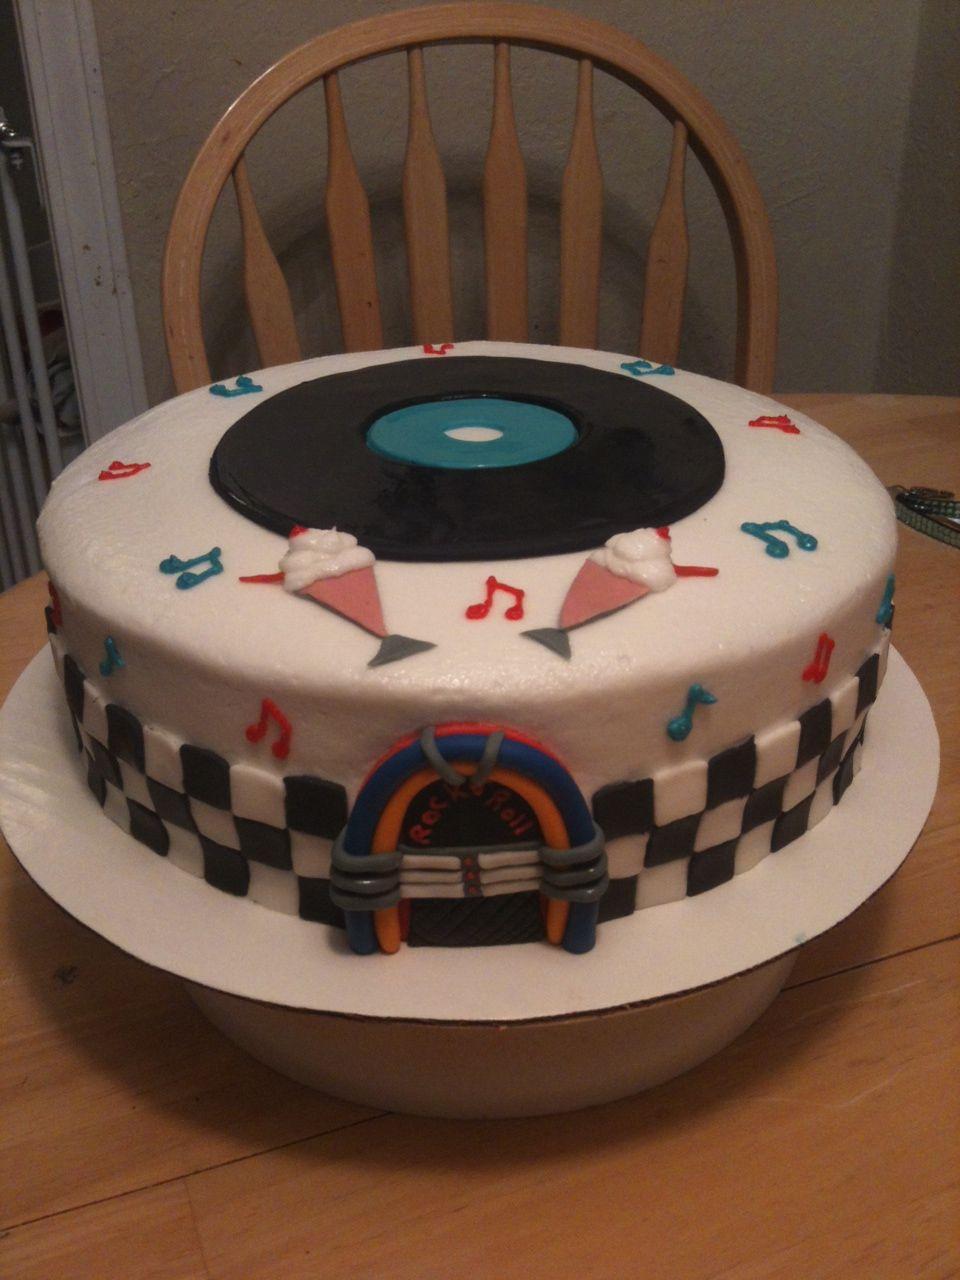 50s rock and roll cake 50s theme cake fondant jukebox record